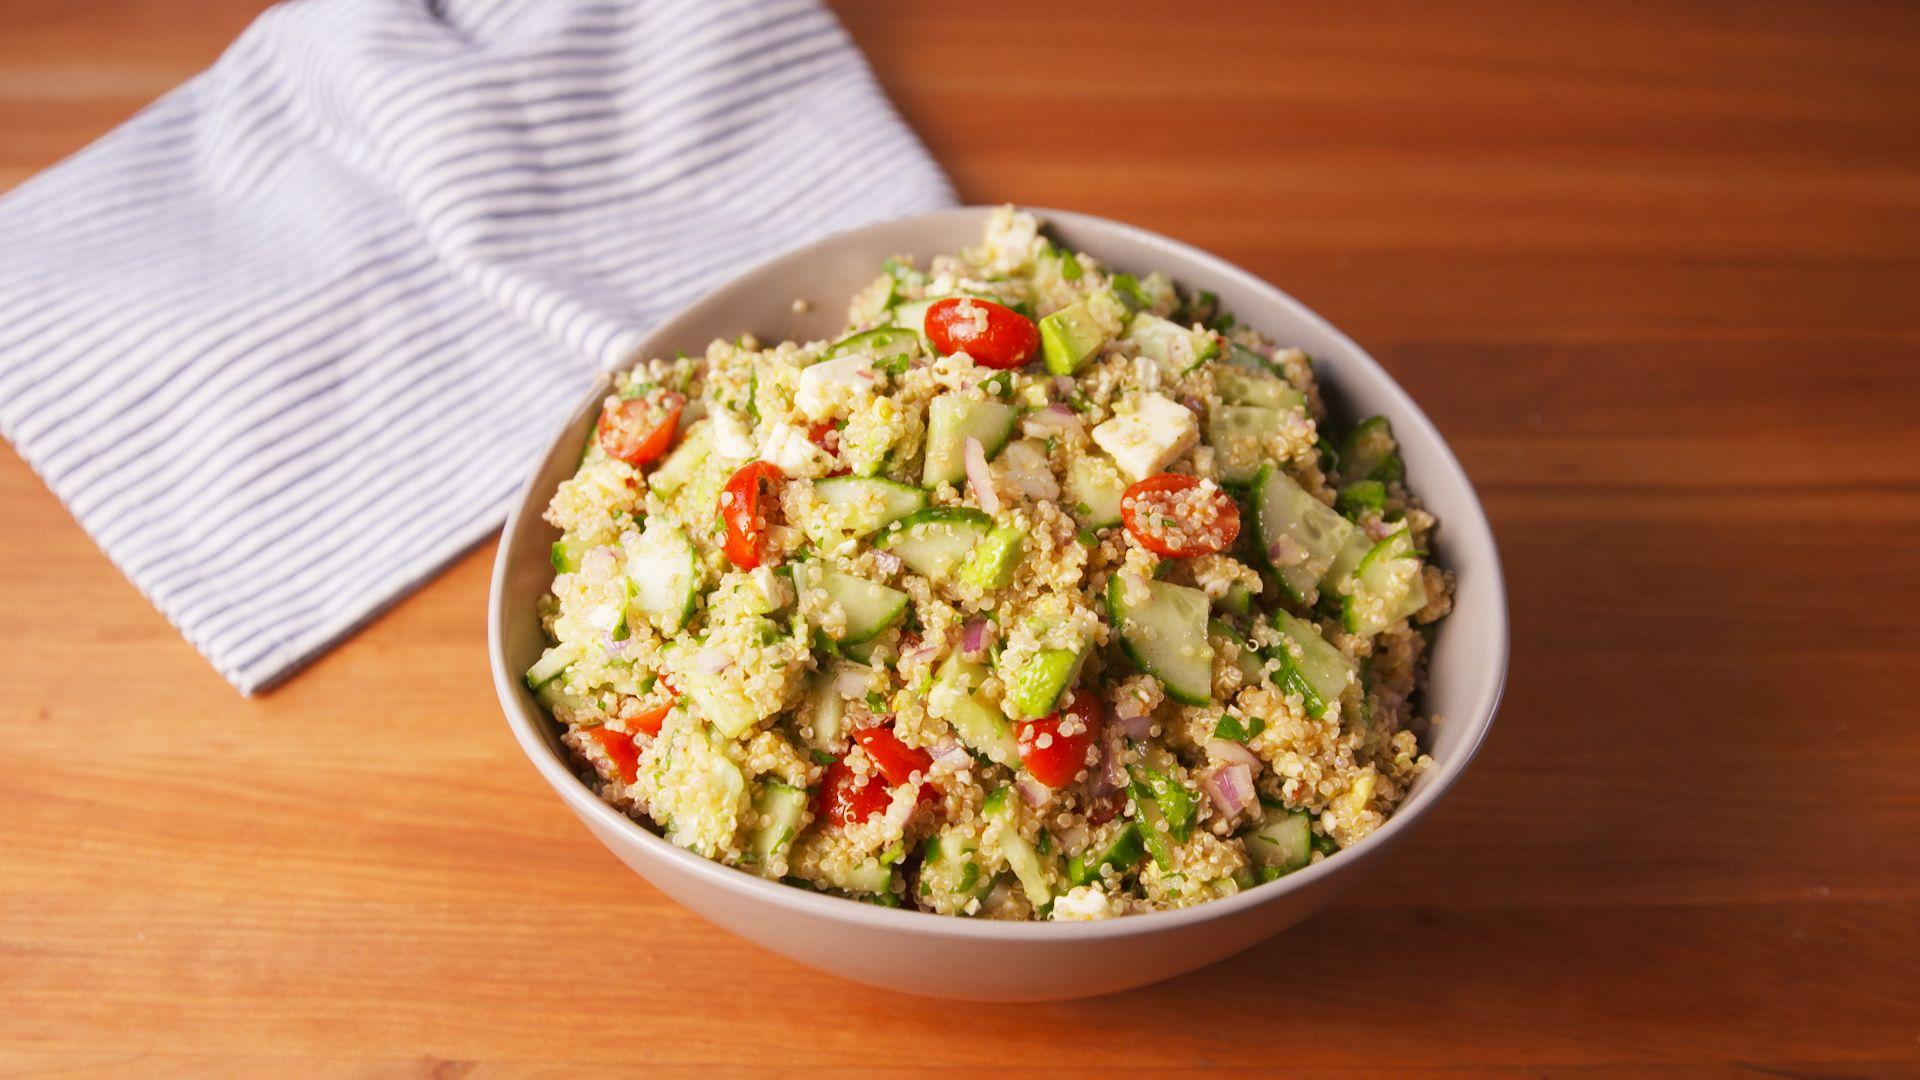 Easy Zesty Mediterranean Quinoa Salad Recipe How To Make Quinoa Salad